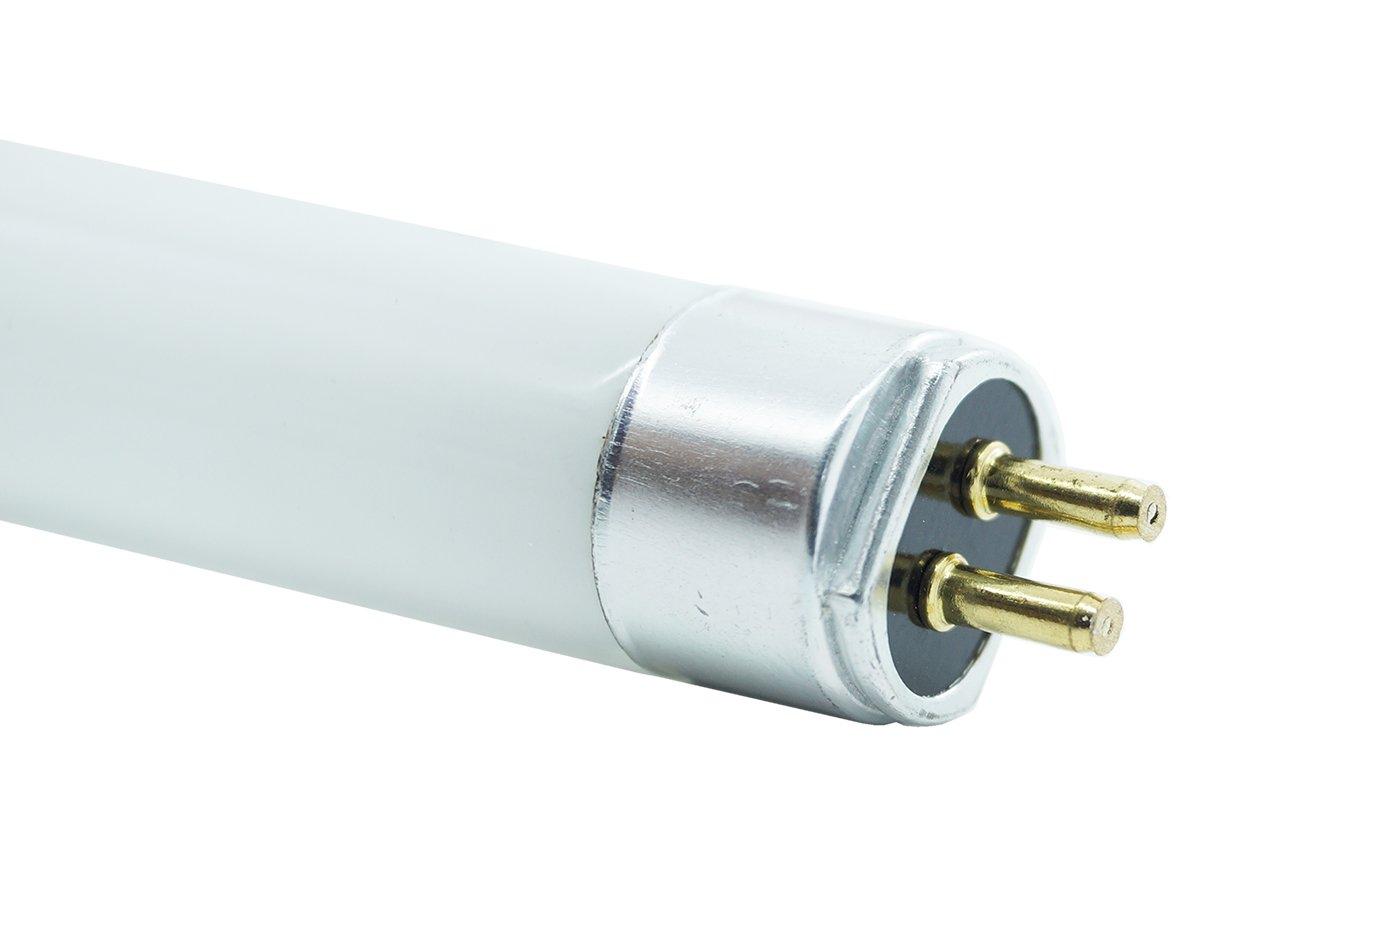 Plafoniera Neon Con Emergenza : Tubo neon bianco watt f t cw cm luce lampada emergenza